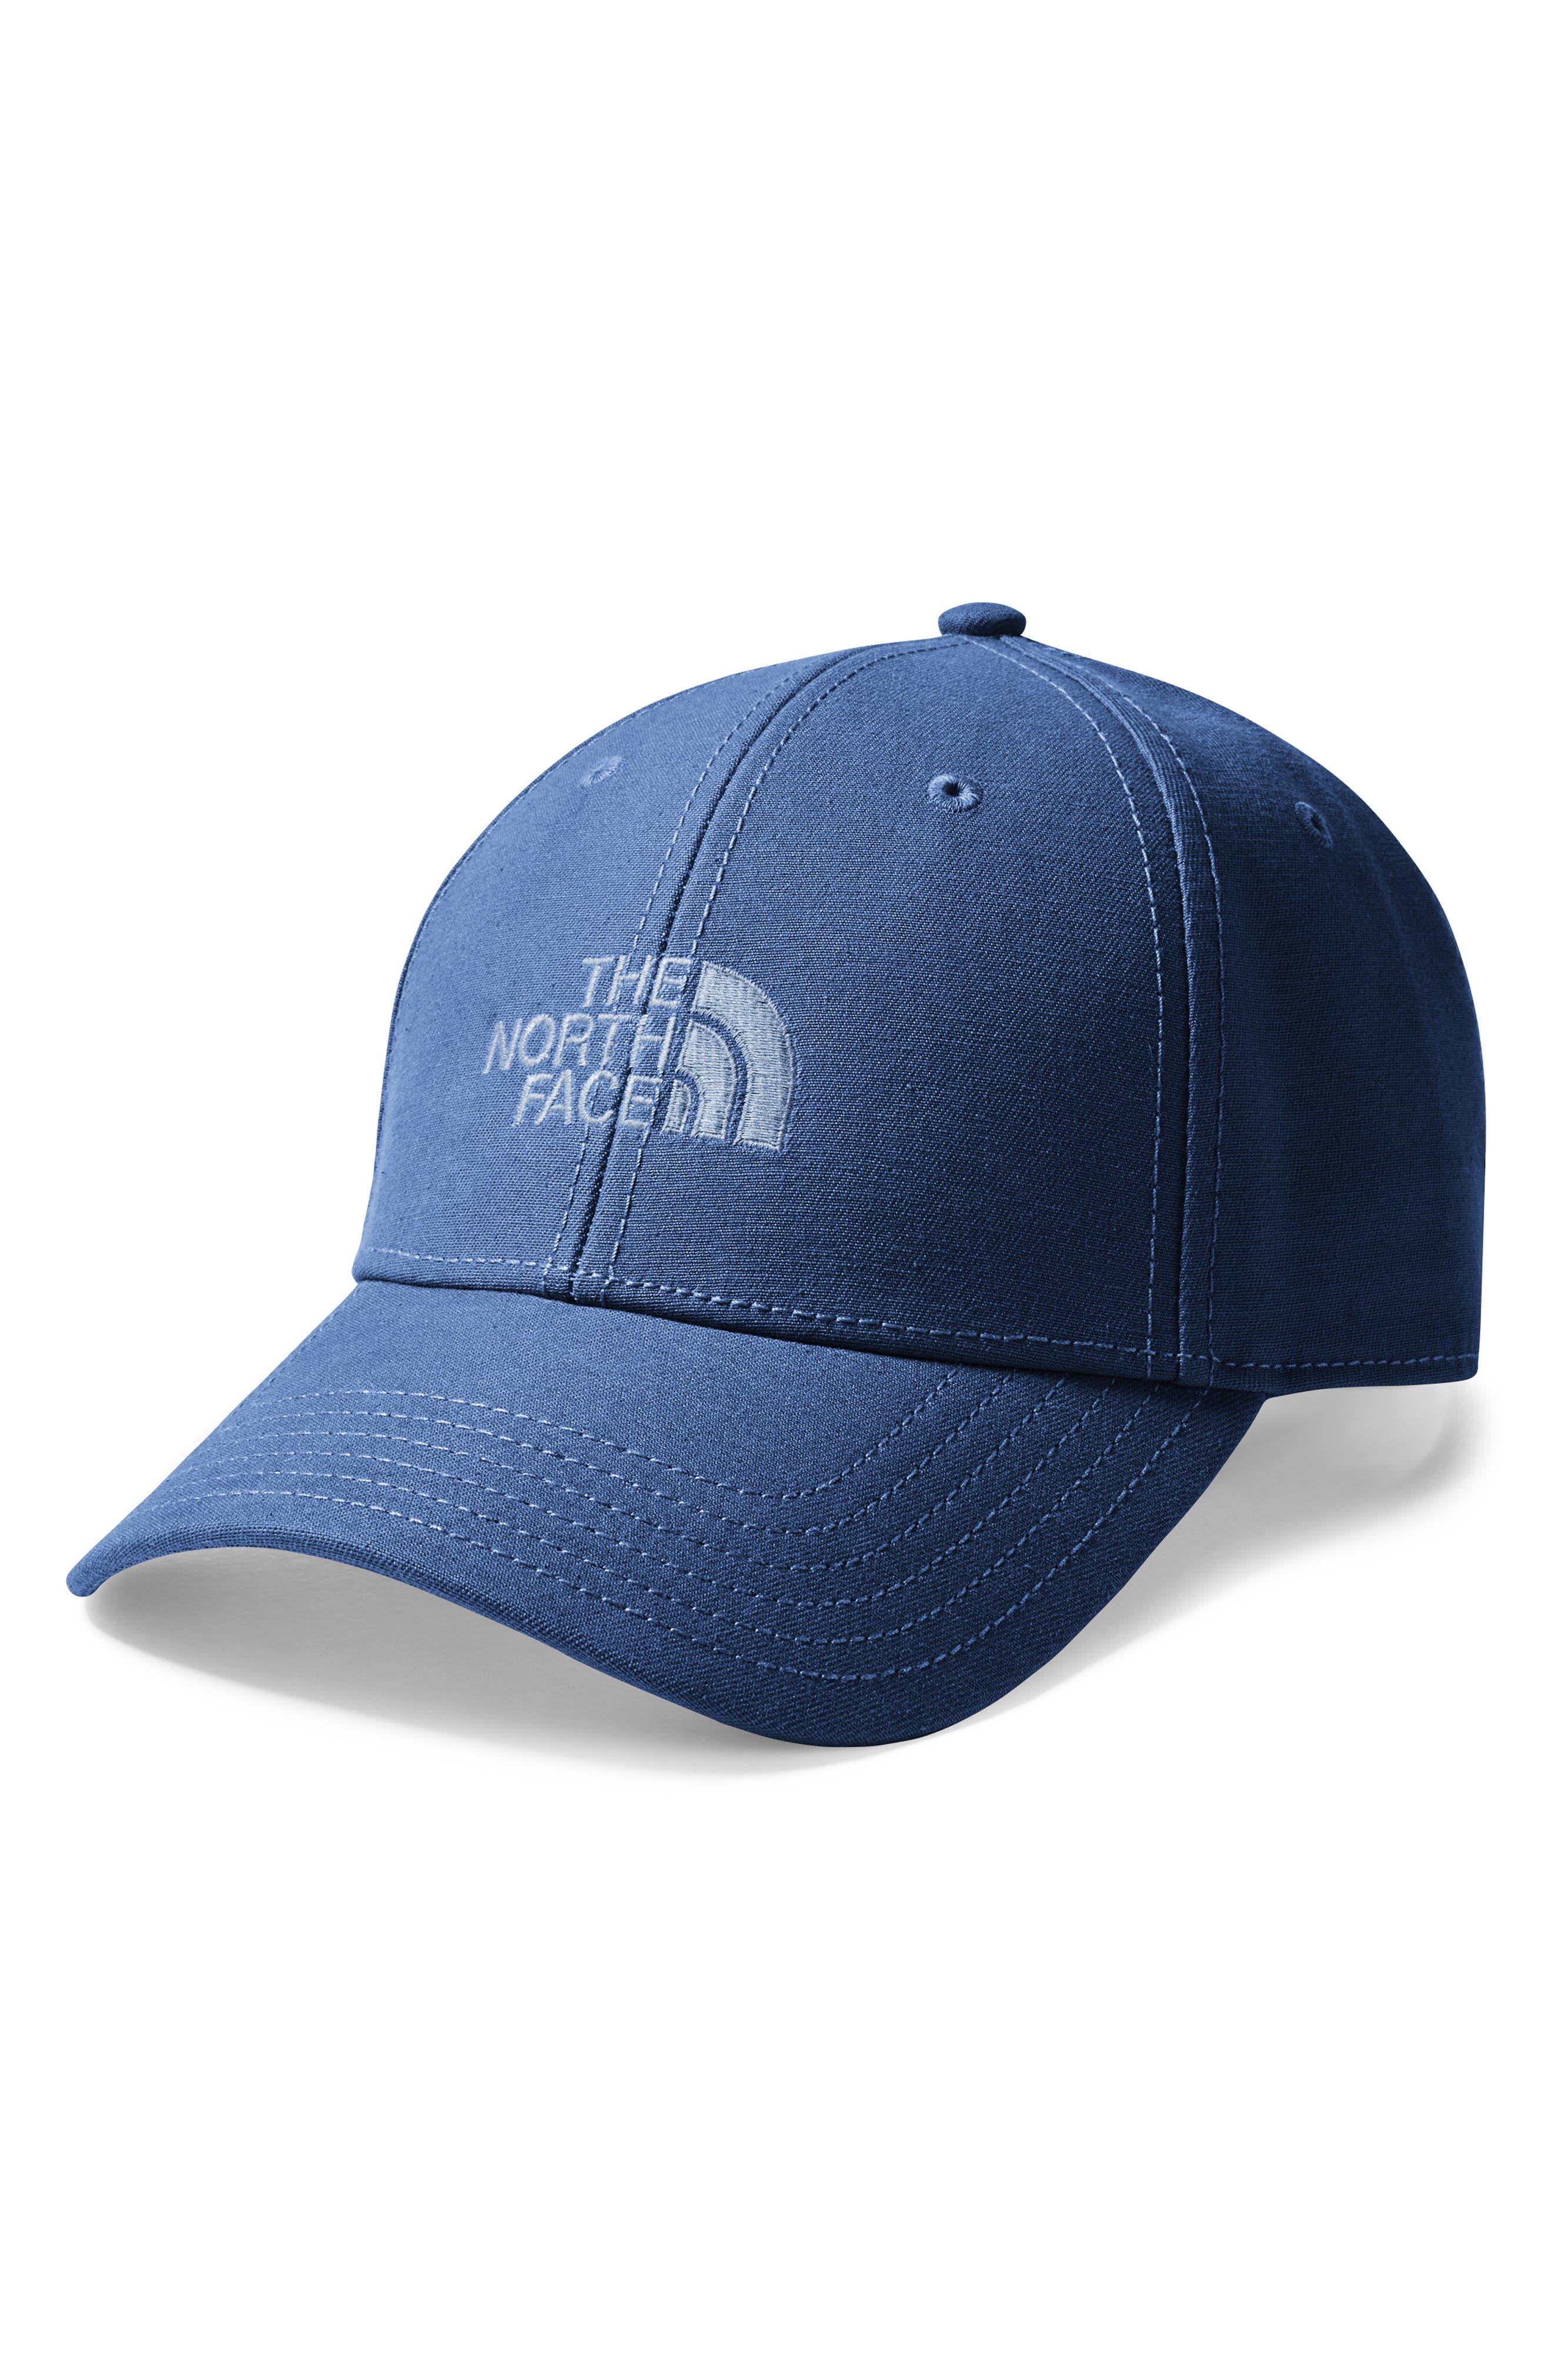 66 Classic Cap,                         Main,                         color, SHADY BLUE/ GULL BLUE